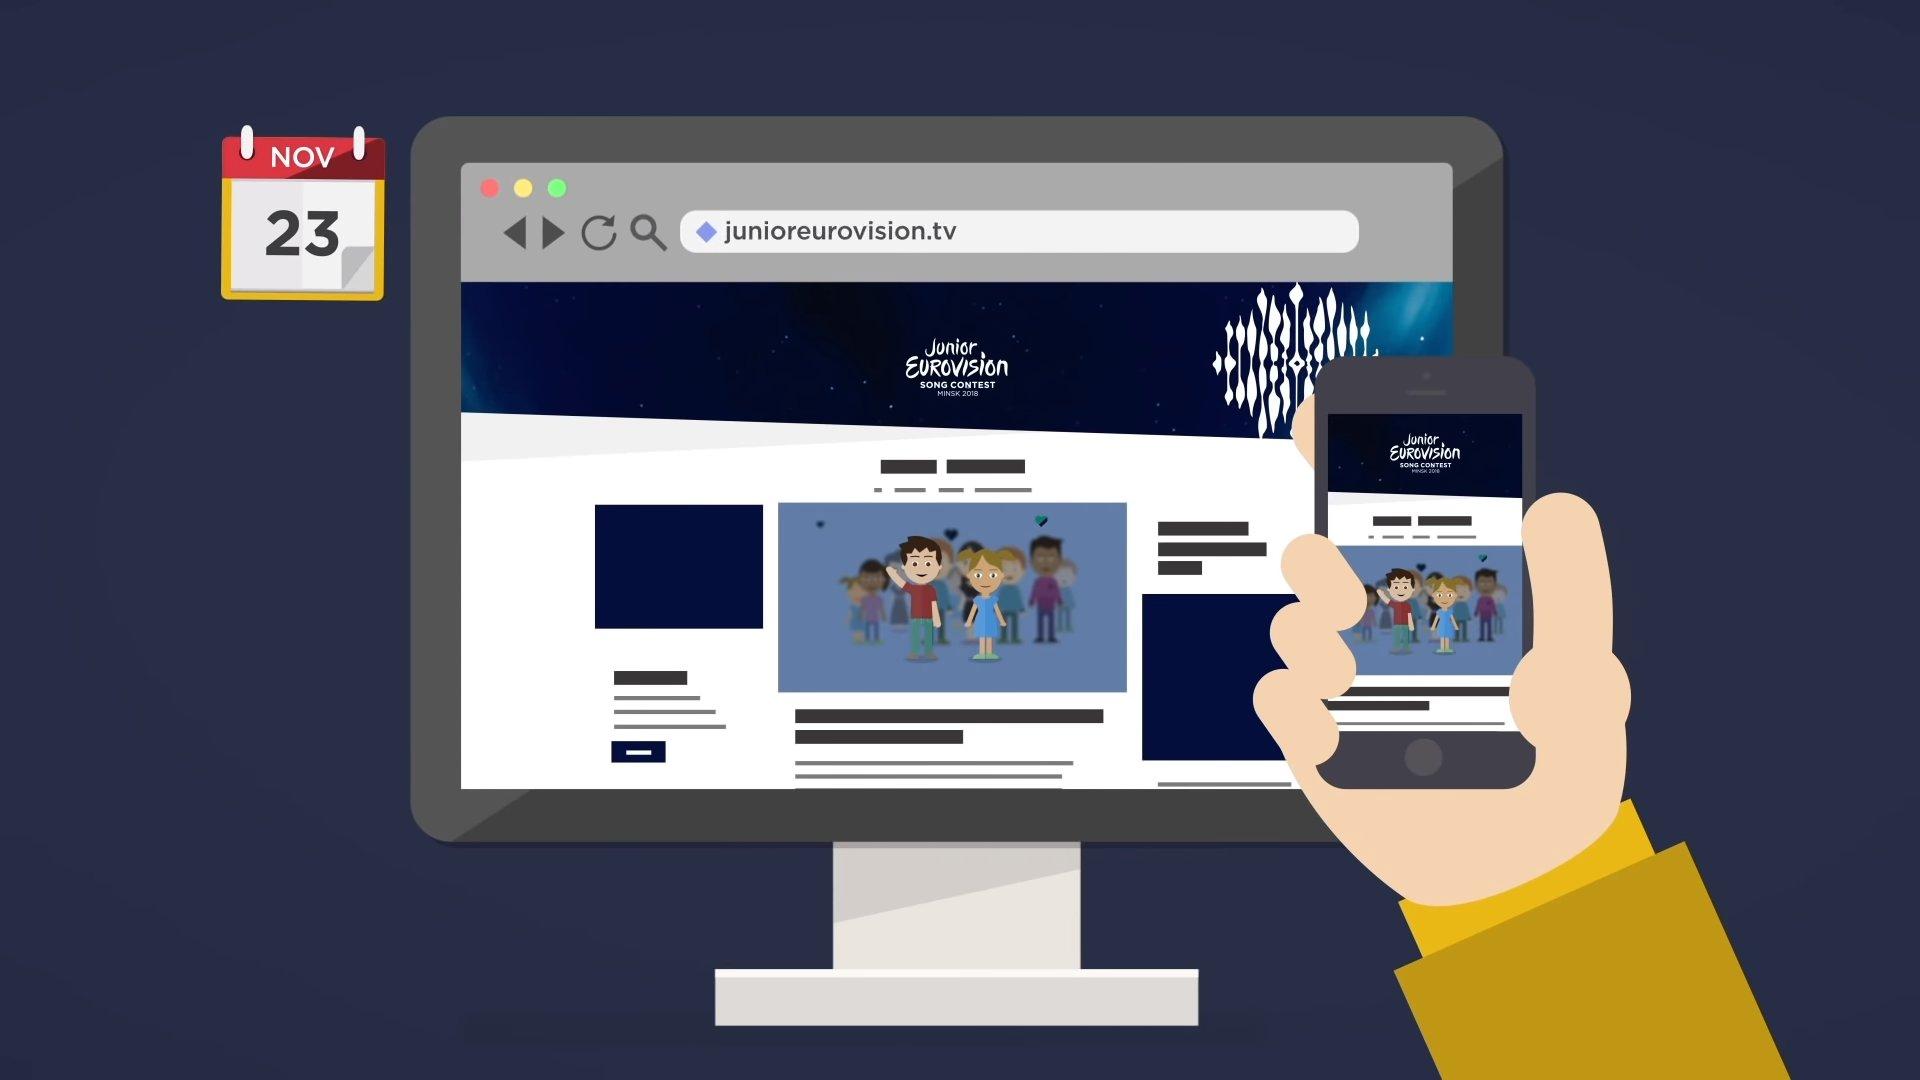 jesc 2018 voting online